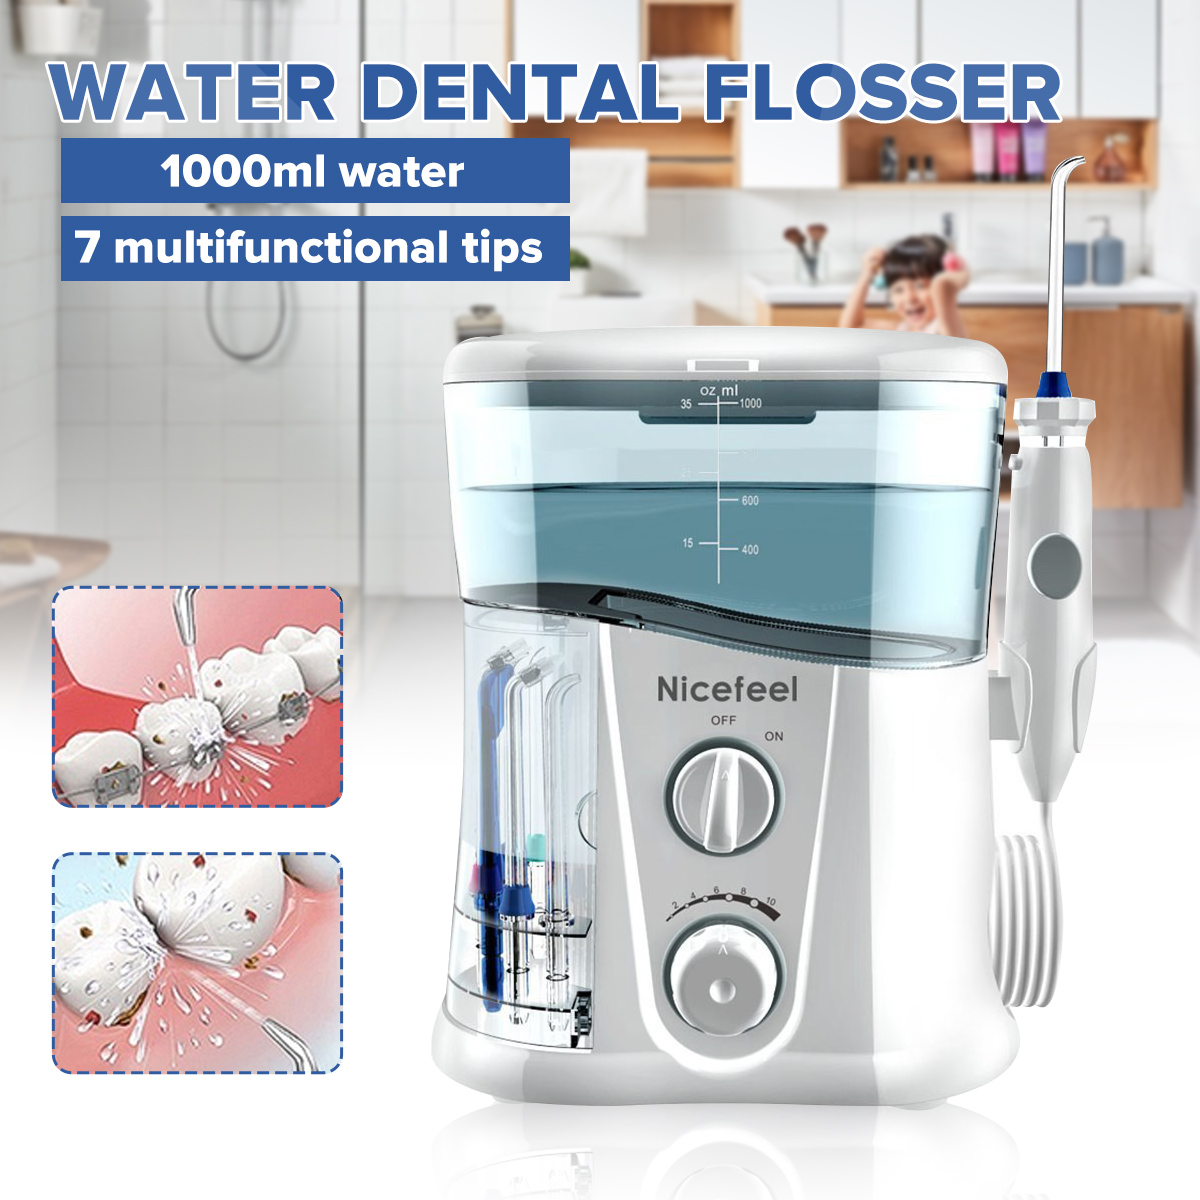 Appliances Irrigator-Care Water-Flosser-Jet Water-Toothbrush Nicefeel Dental-Spa Oral